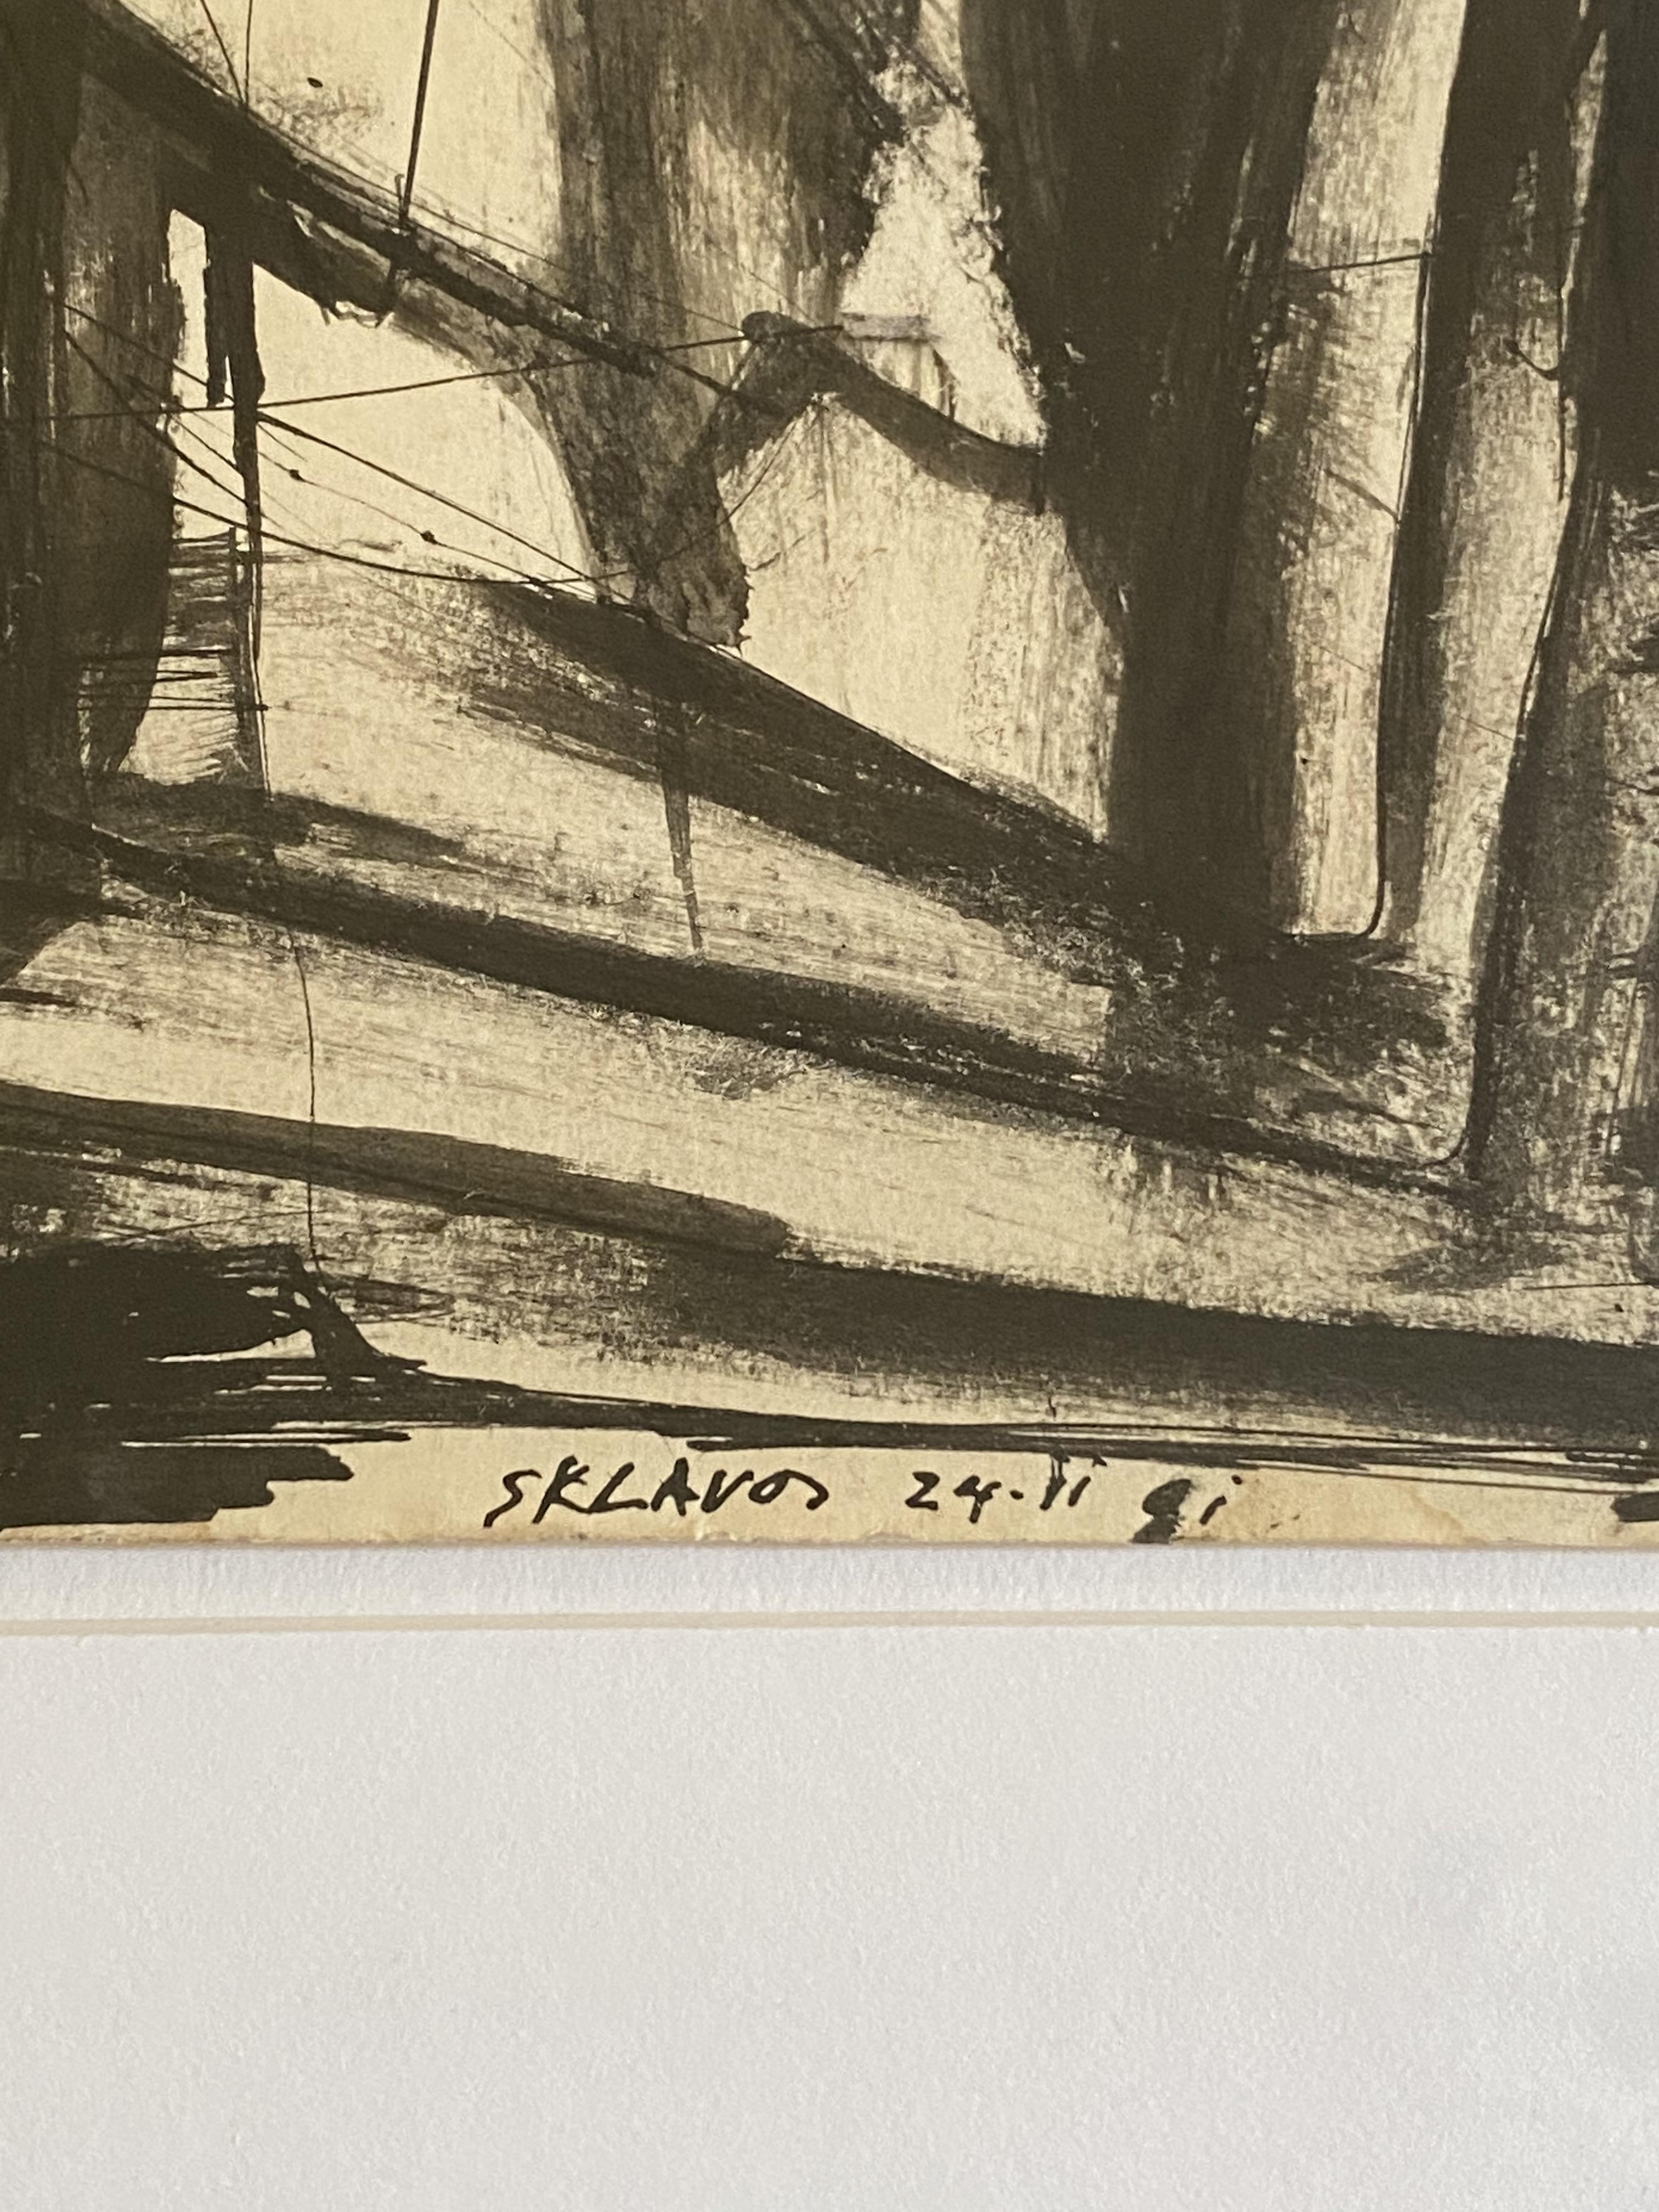 Yerassimos Sklavos (Greek, 1927-1967) (AR), untitled, 24.11.1961, ink on paper. 27.5 x 21 cm. - Image 2 of 2